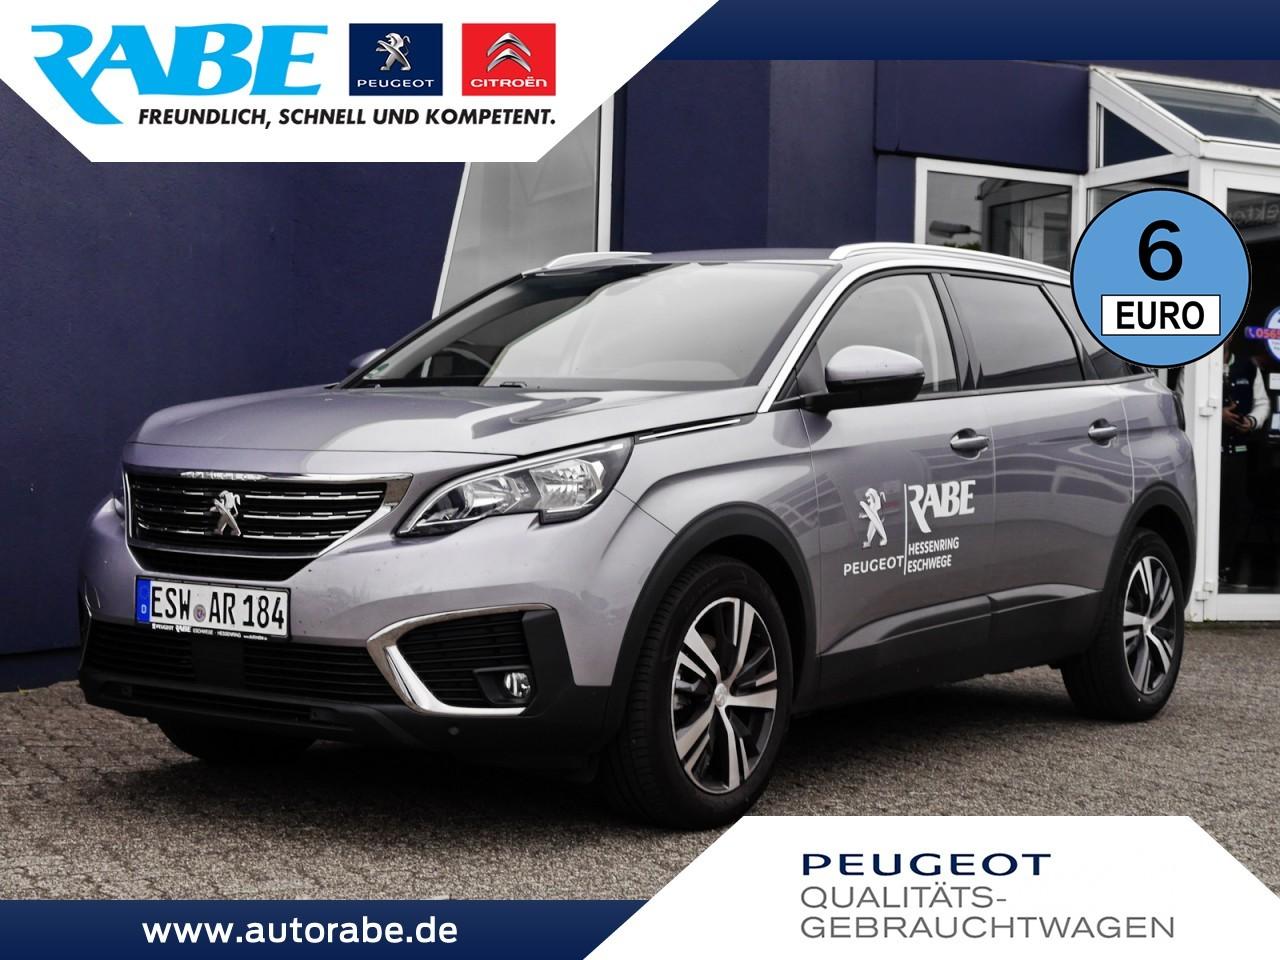 Peugeot 5008 Active+ 130 Sitzheizung+Navi+Klima+Kamera, Jahr 2018, Benzin